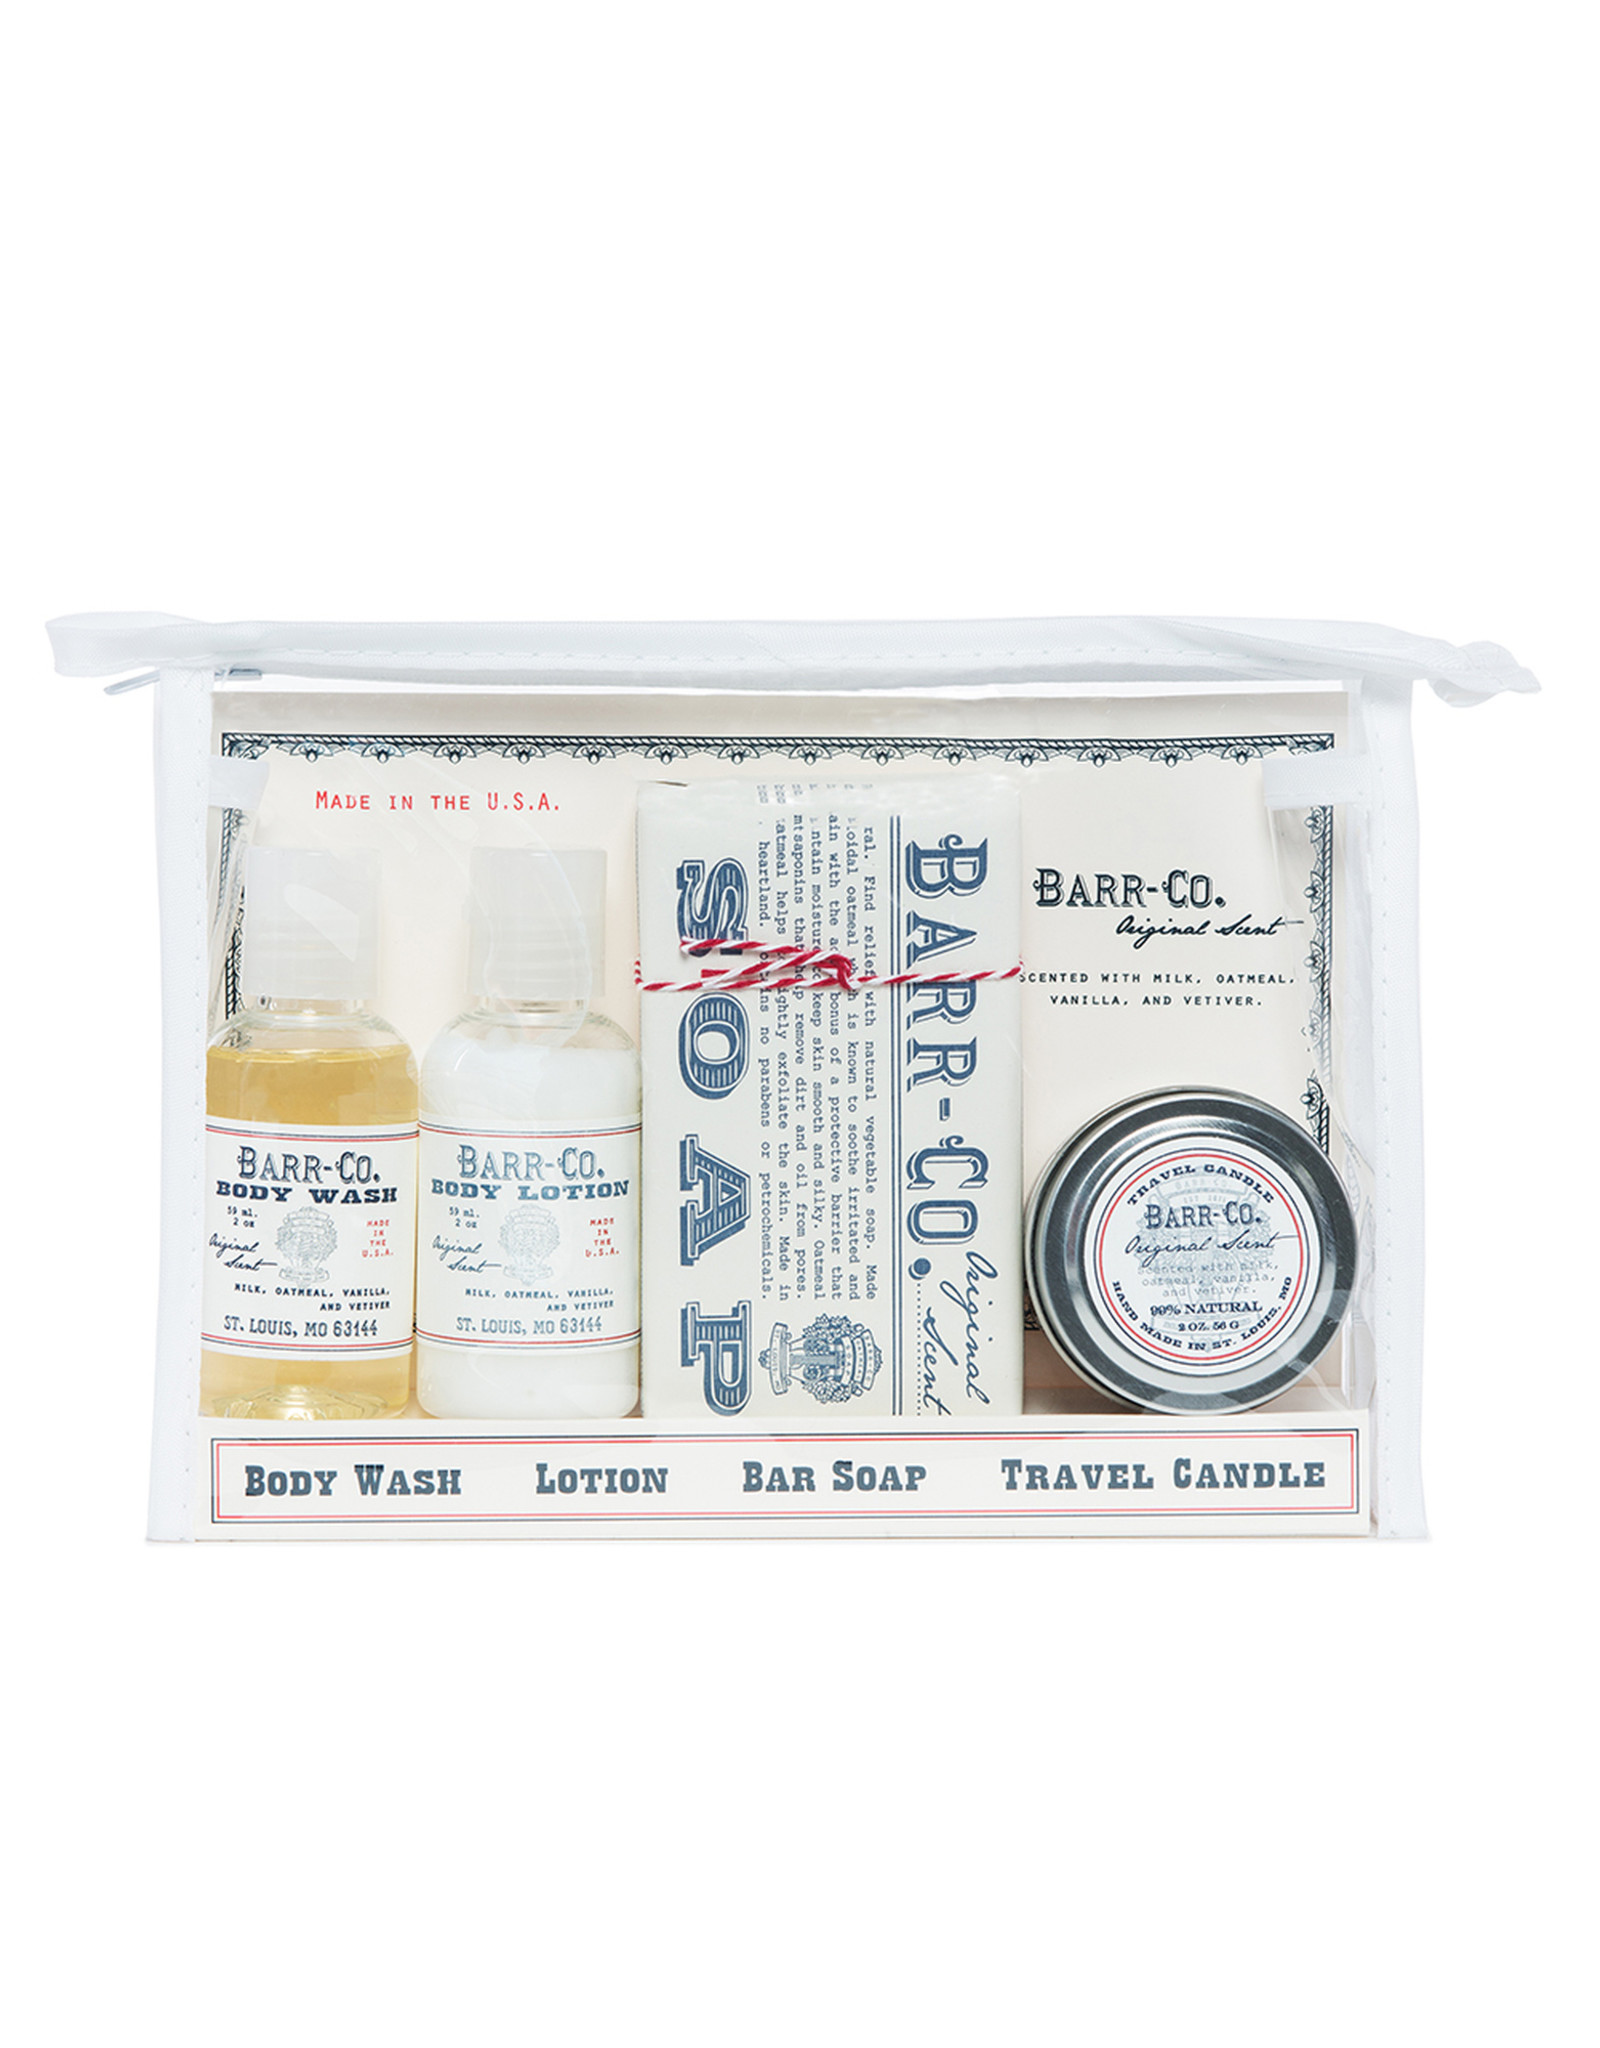 Barr-Co Barr-Co Original Scent 4pc Travel Kit